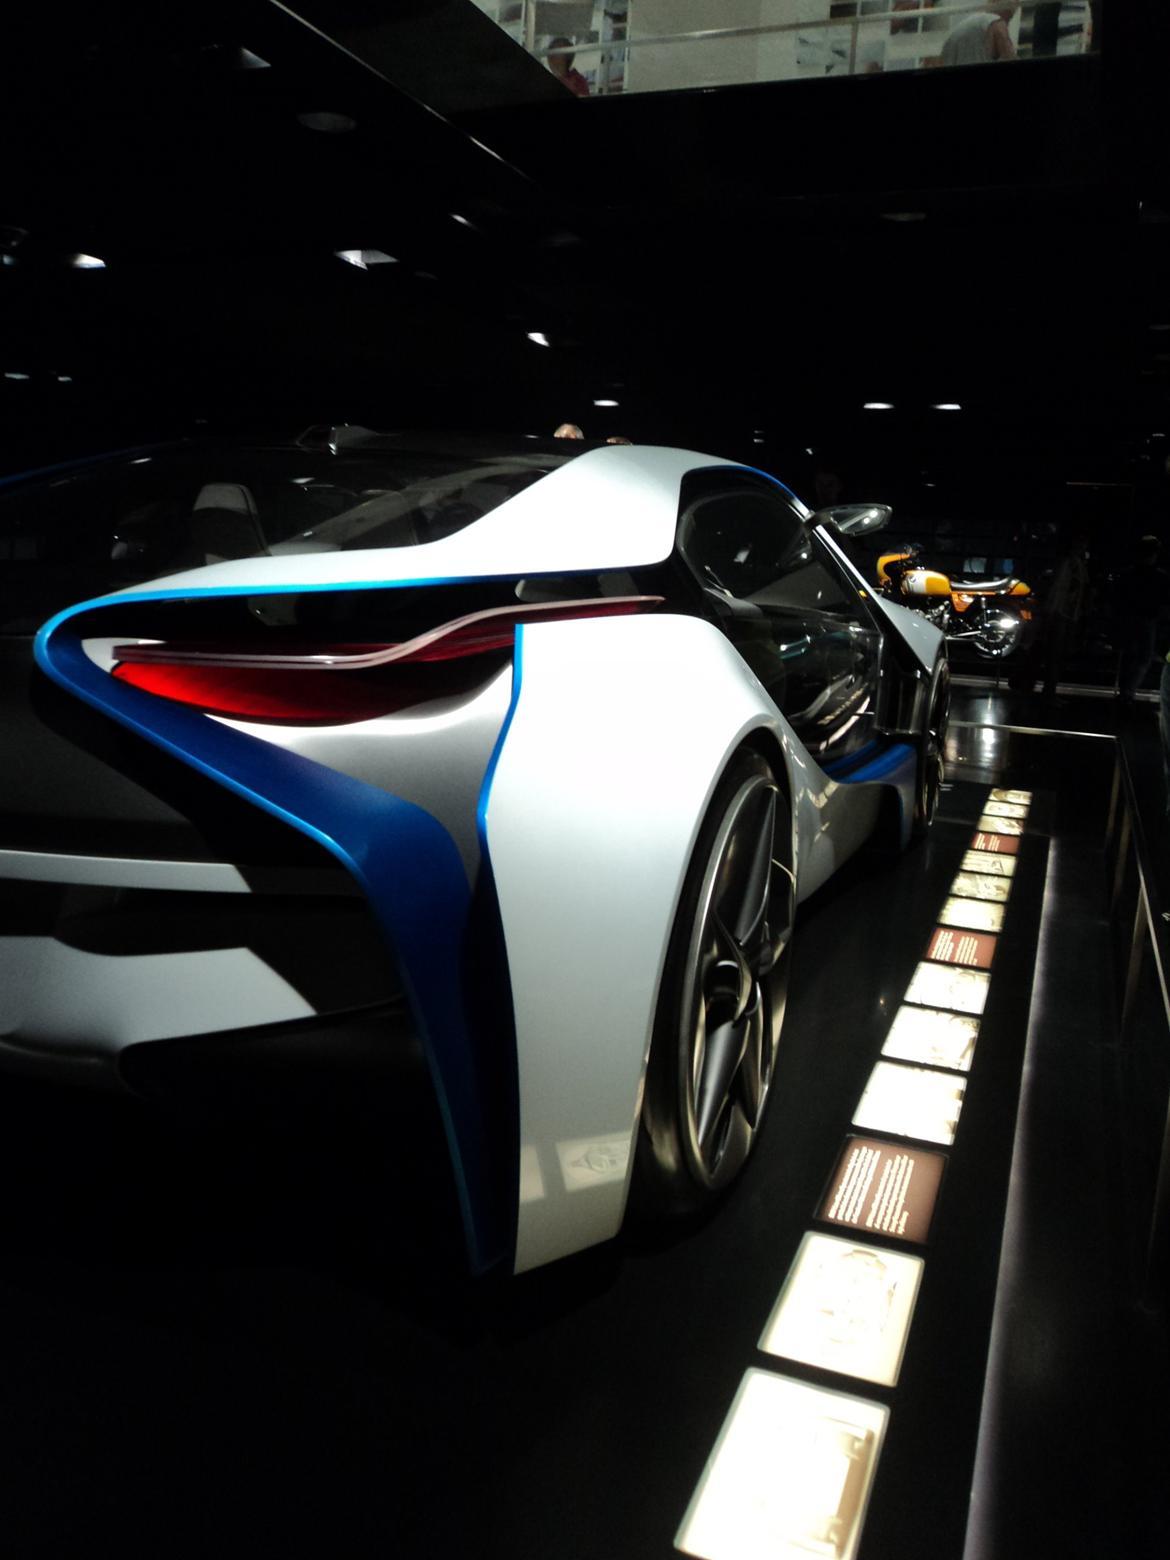 BMW Welt museum i München 2015 billede 182